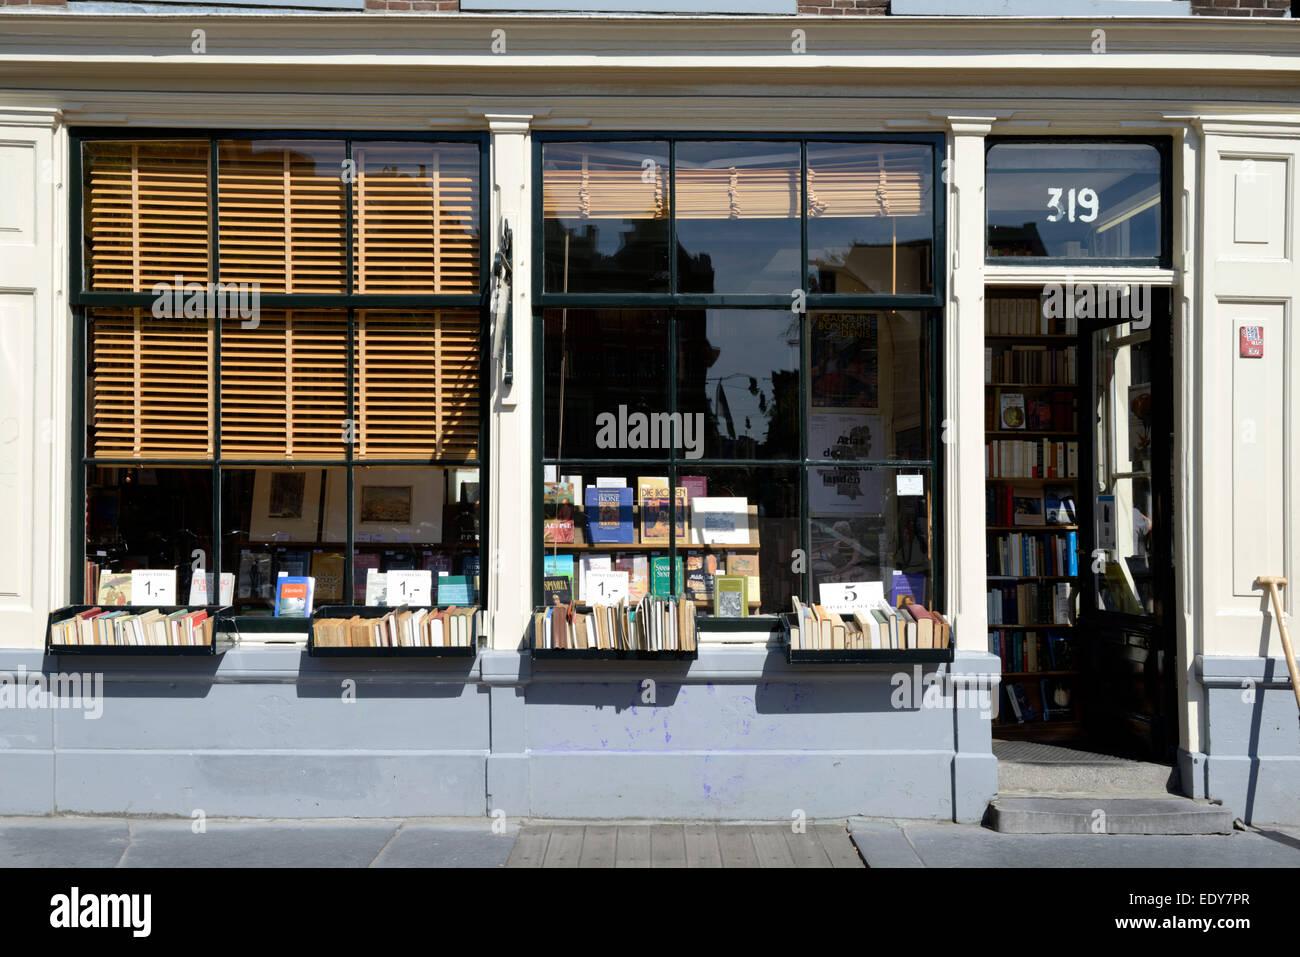 Canalside bookshop, Singel, Amsterdam, North Holland, Netherlands, Europe - Stock Image